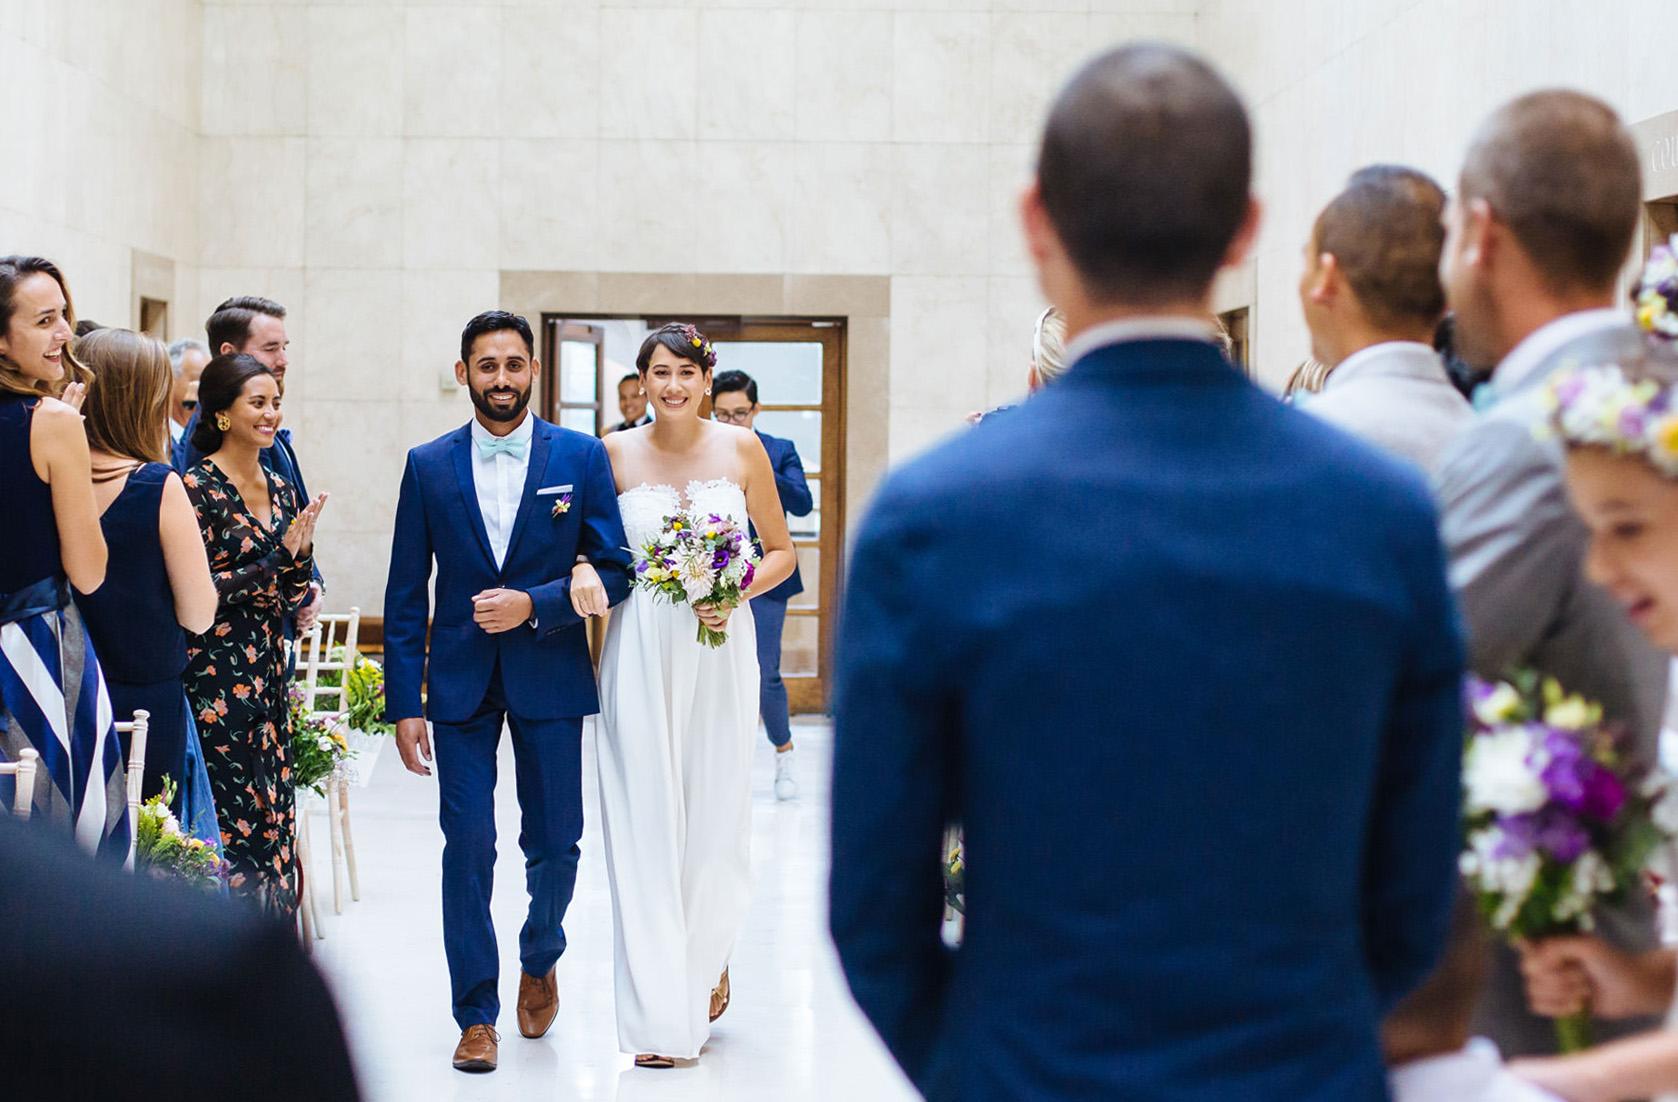 bride walking down aisle at Hammersmith town hall wedding